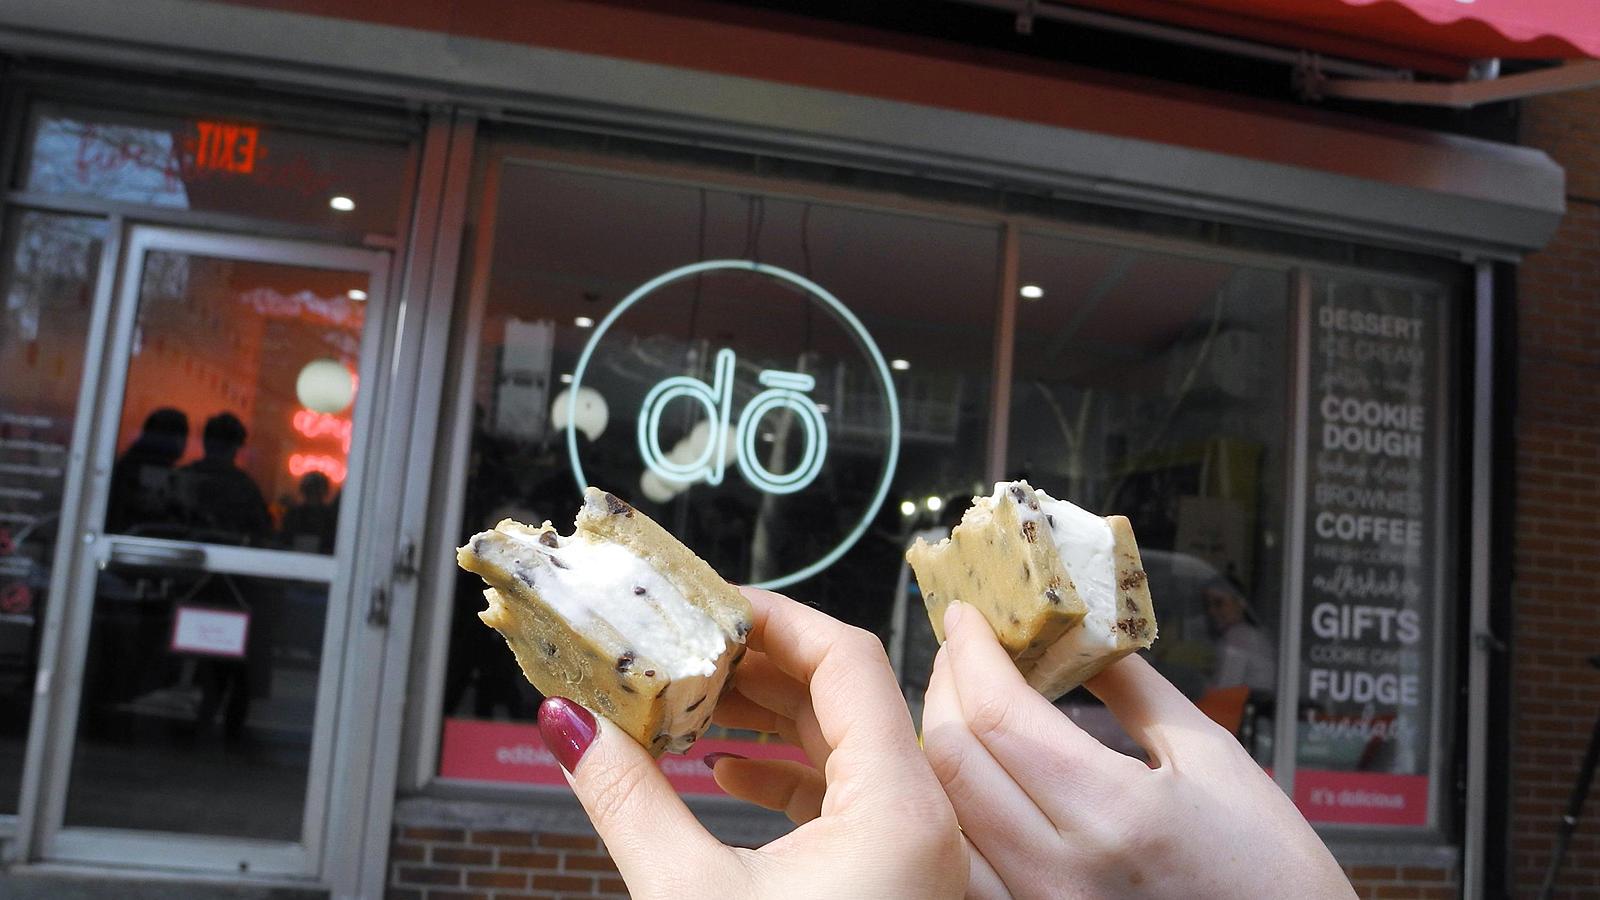 'DO' verkauft ungebackenen Keksteig im Becher